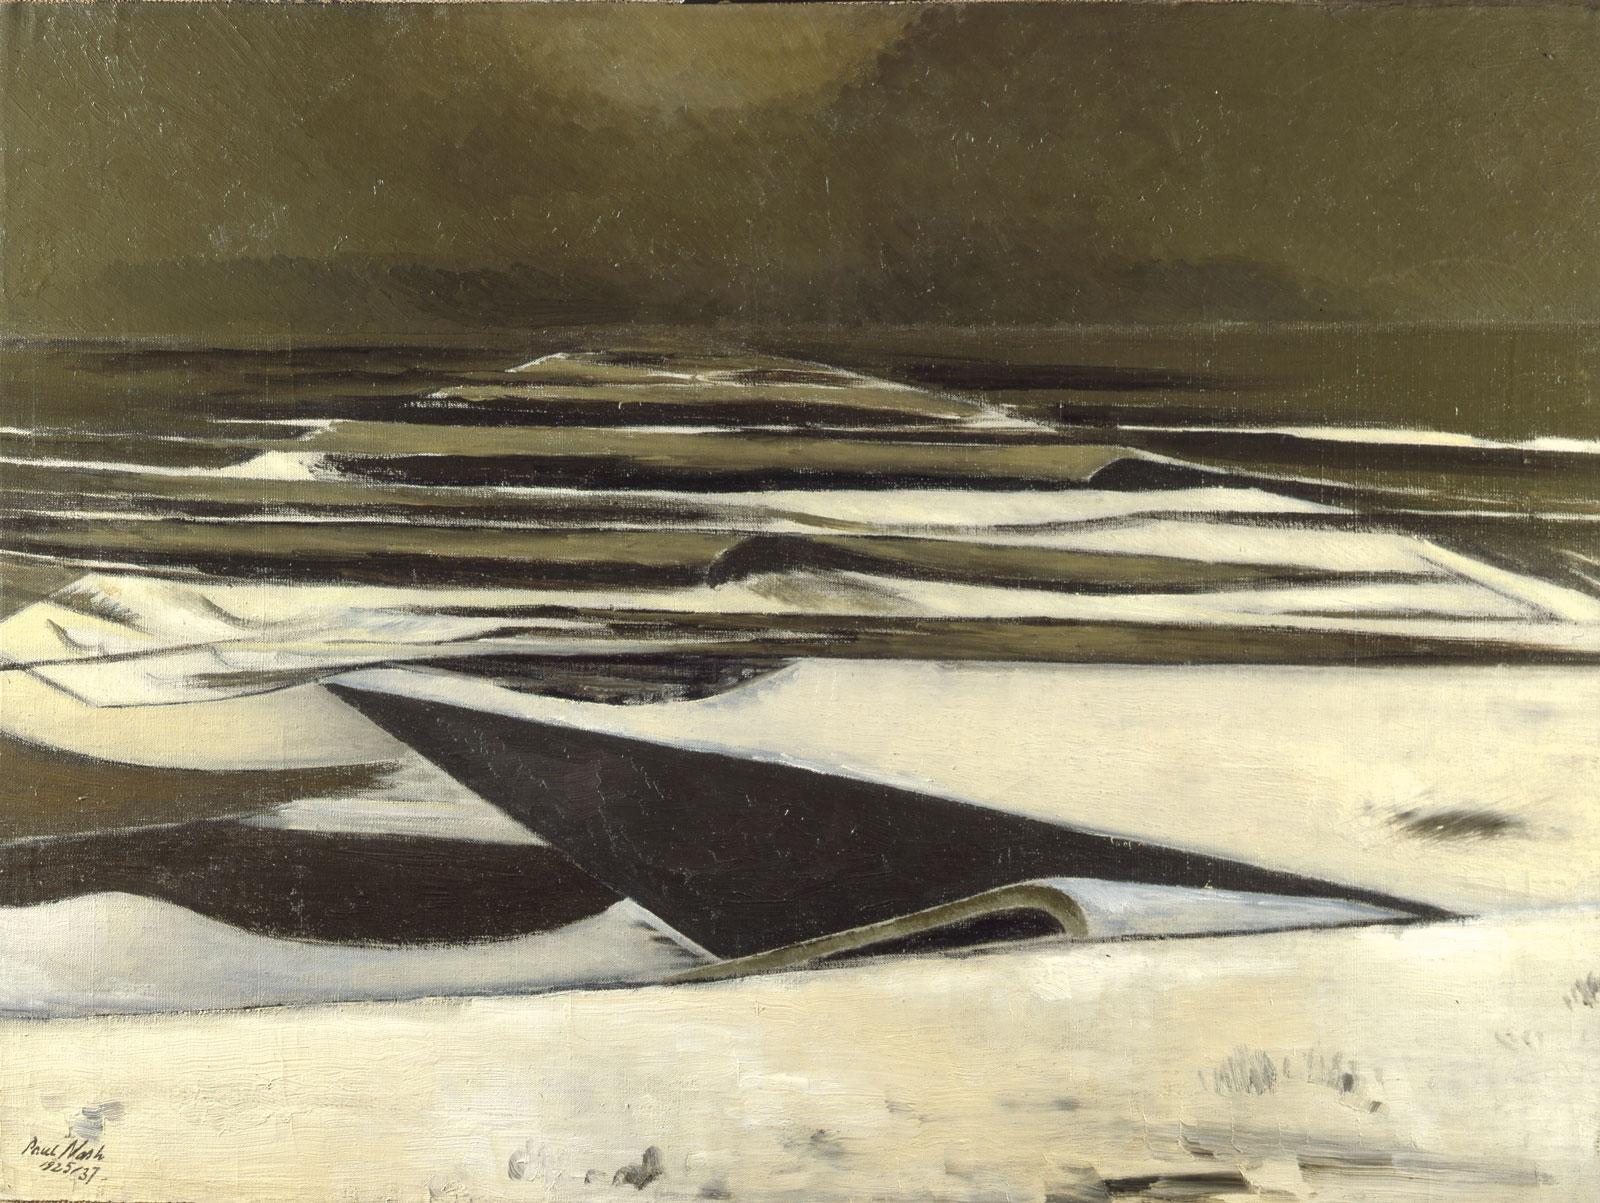 Paul Nash: Winter Sea, 1925-1937